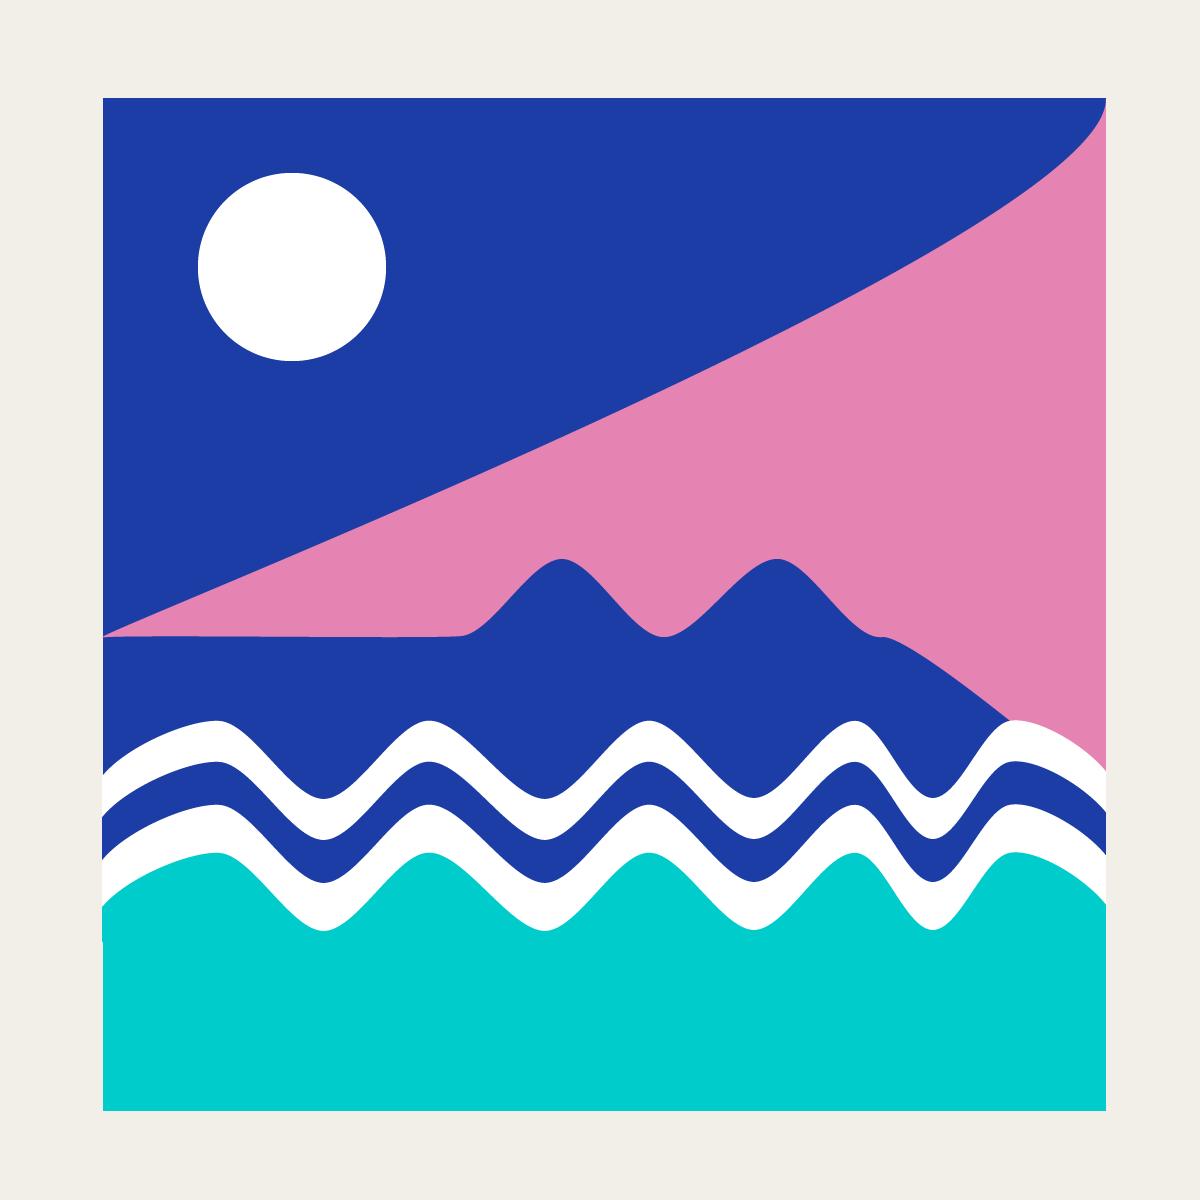 Moonlight surfing. Digital illustration by Naomi Anne Little